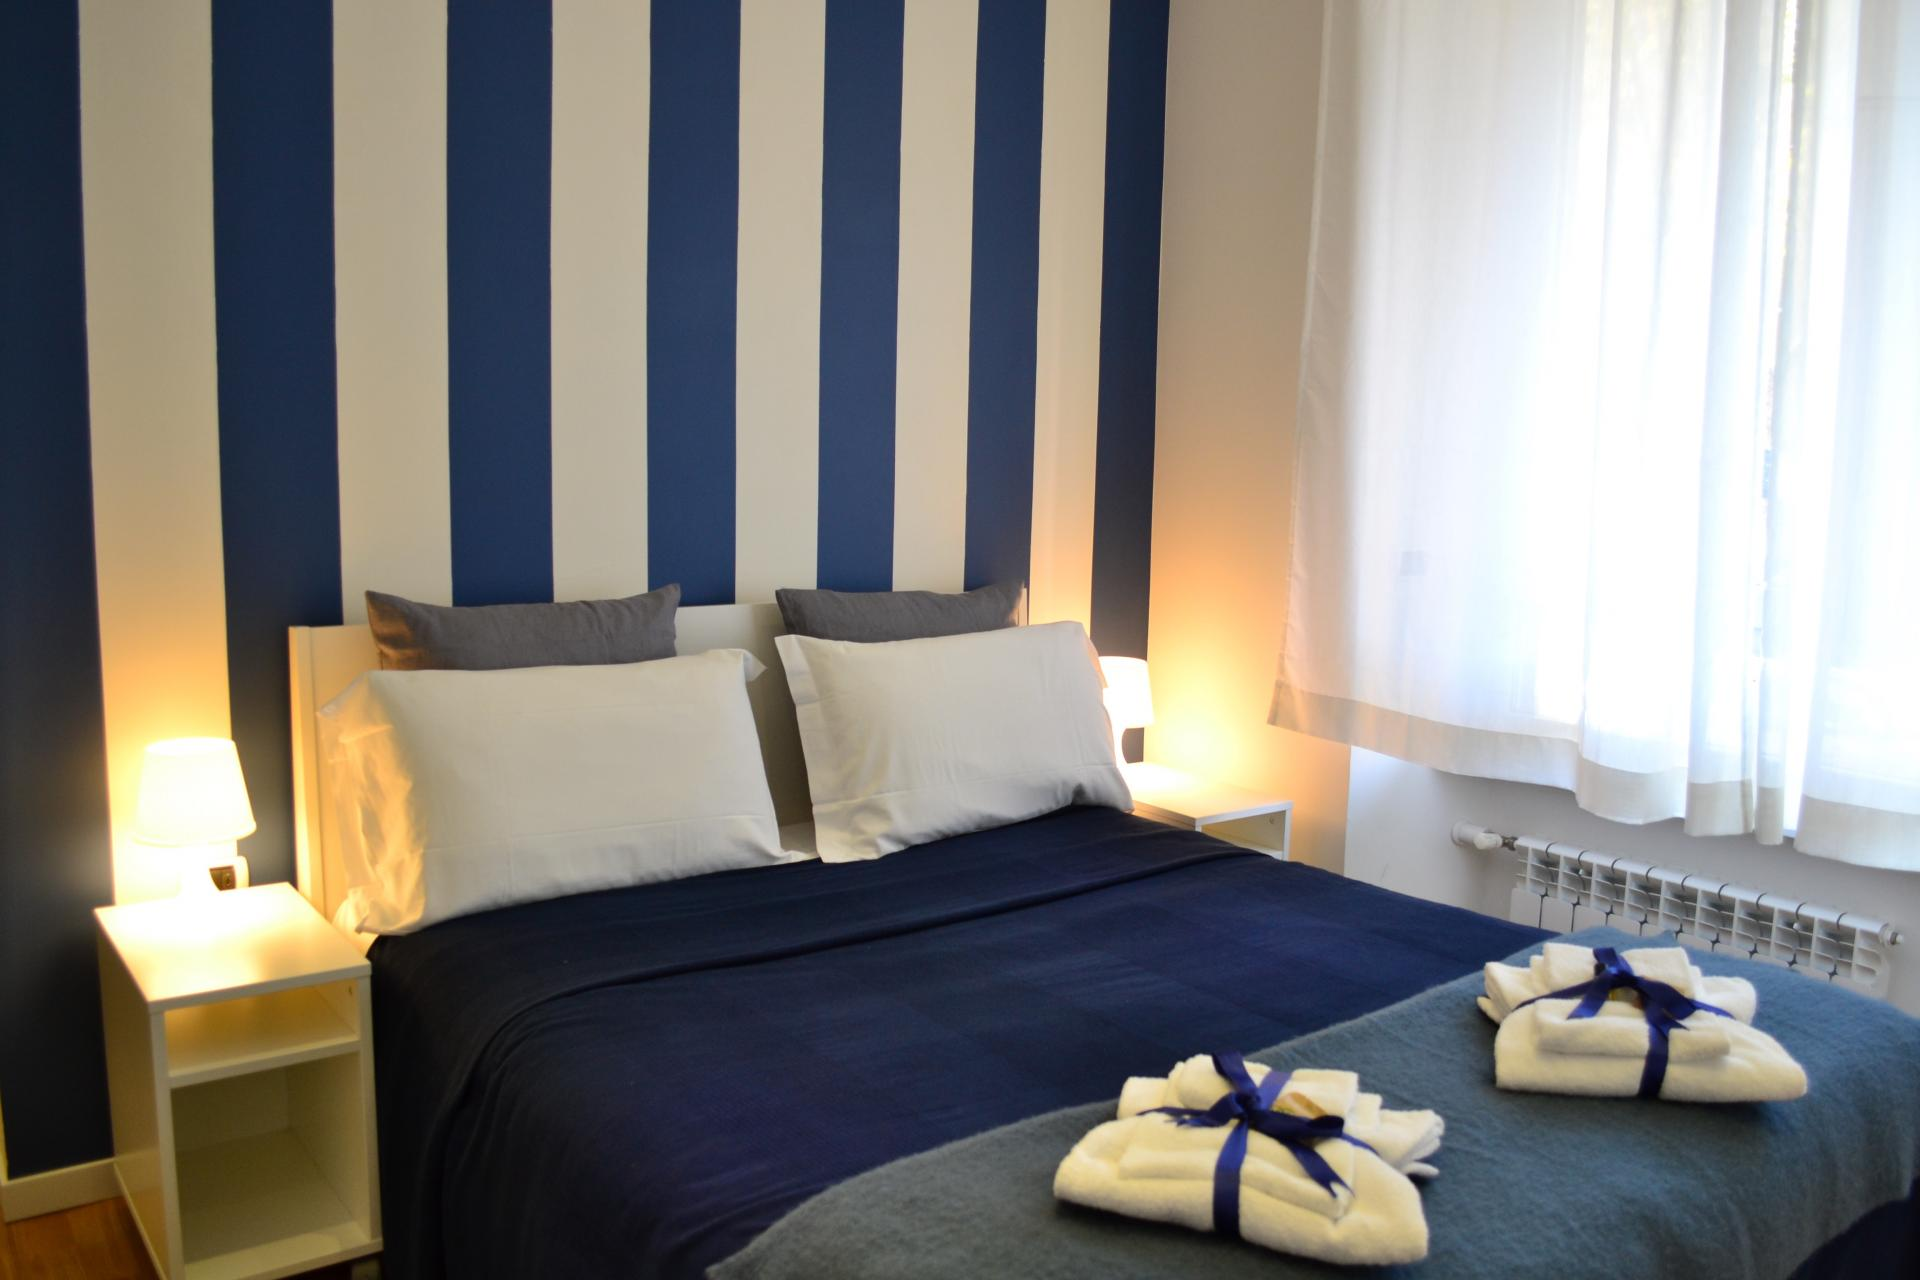 Bed at Angelico Grand Apartment, Prati, Rome